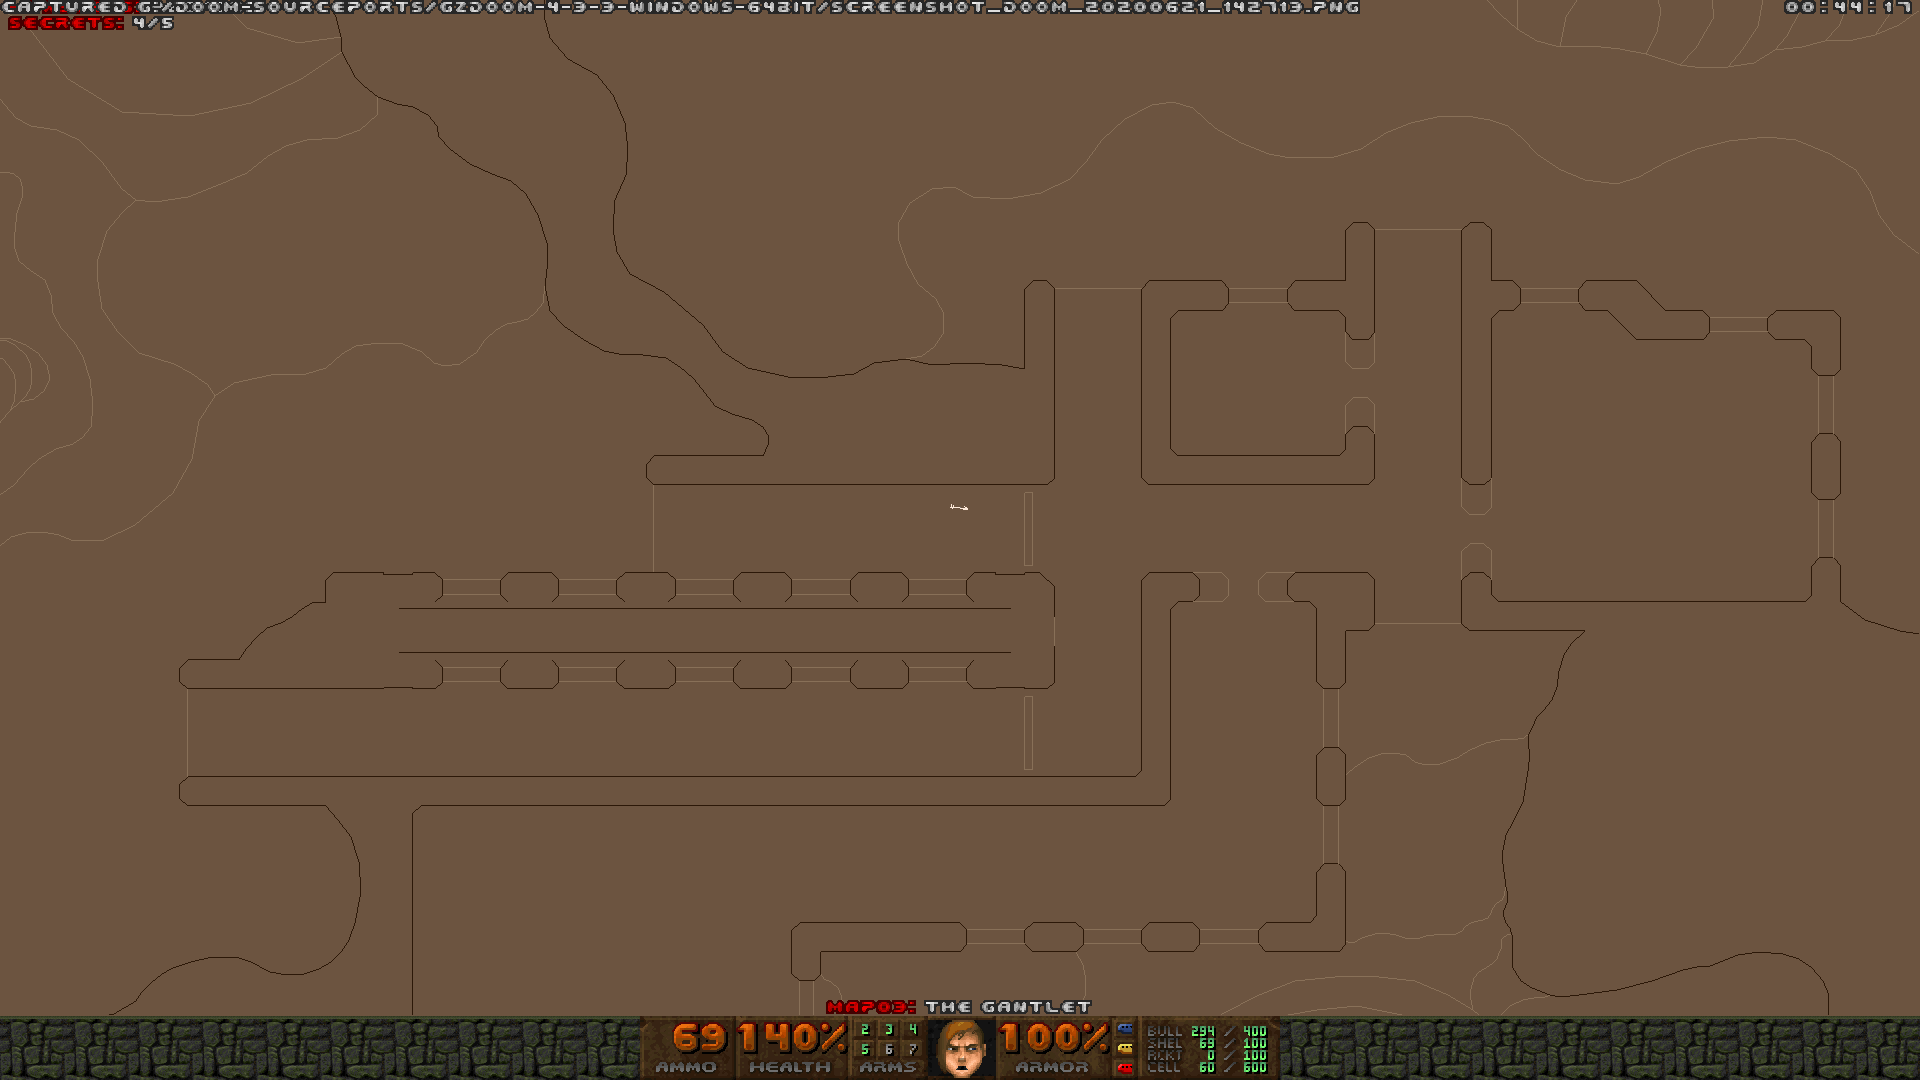 Screenshot_Doom_20200621_142715.png.f6eb77f1d7b2c818875ef140f1a89da0.png